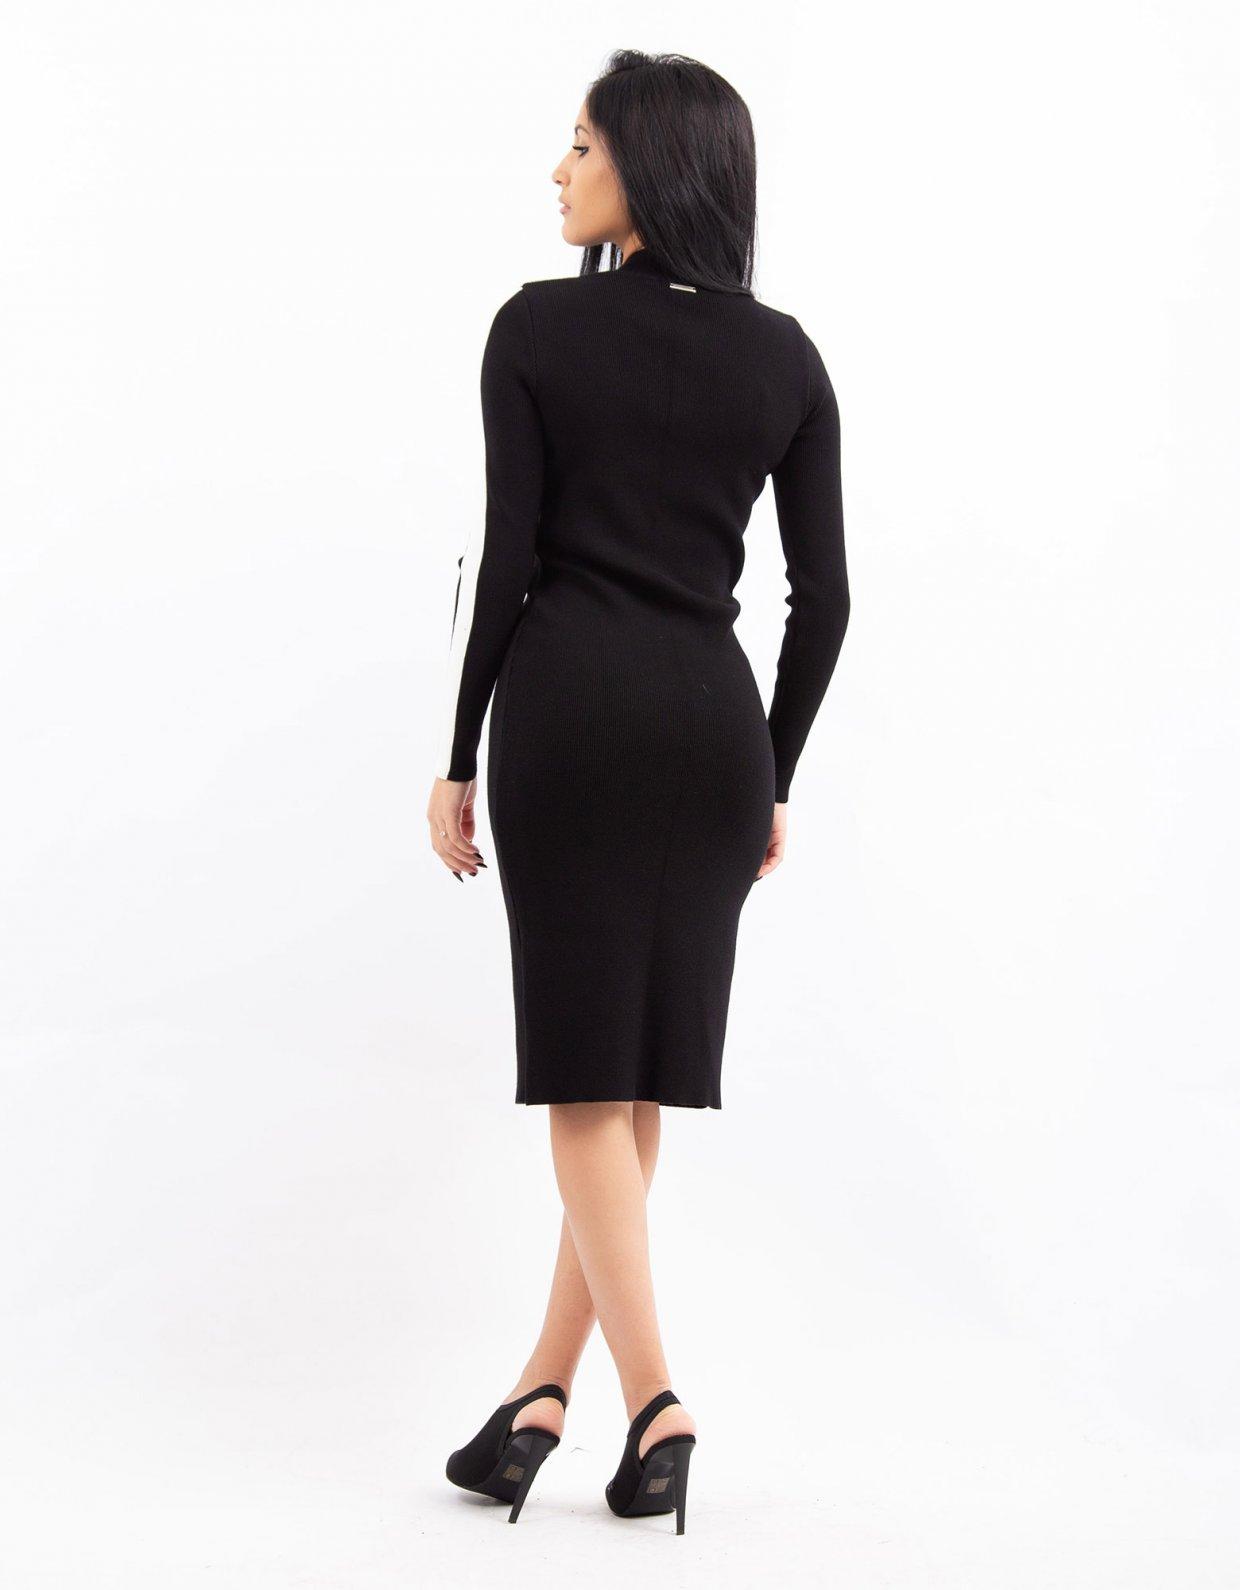 Combos Knitwear Combos W39 – White stripe dress